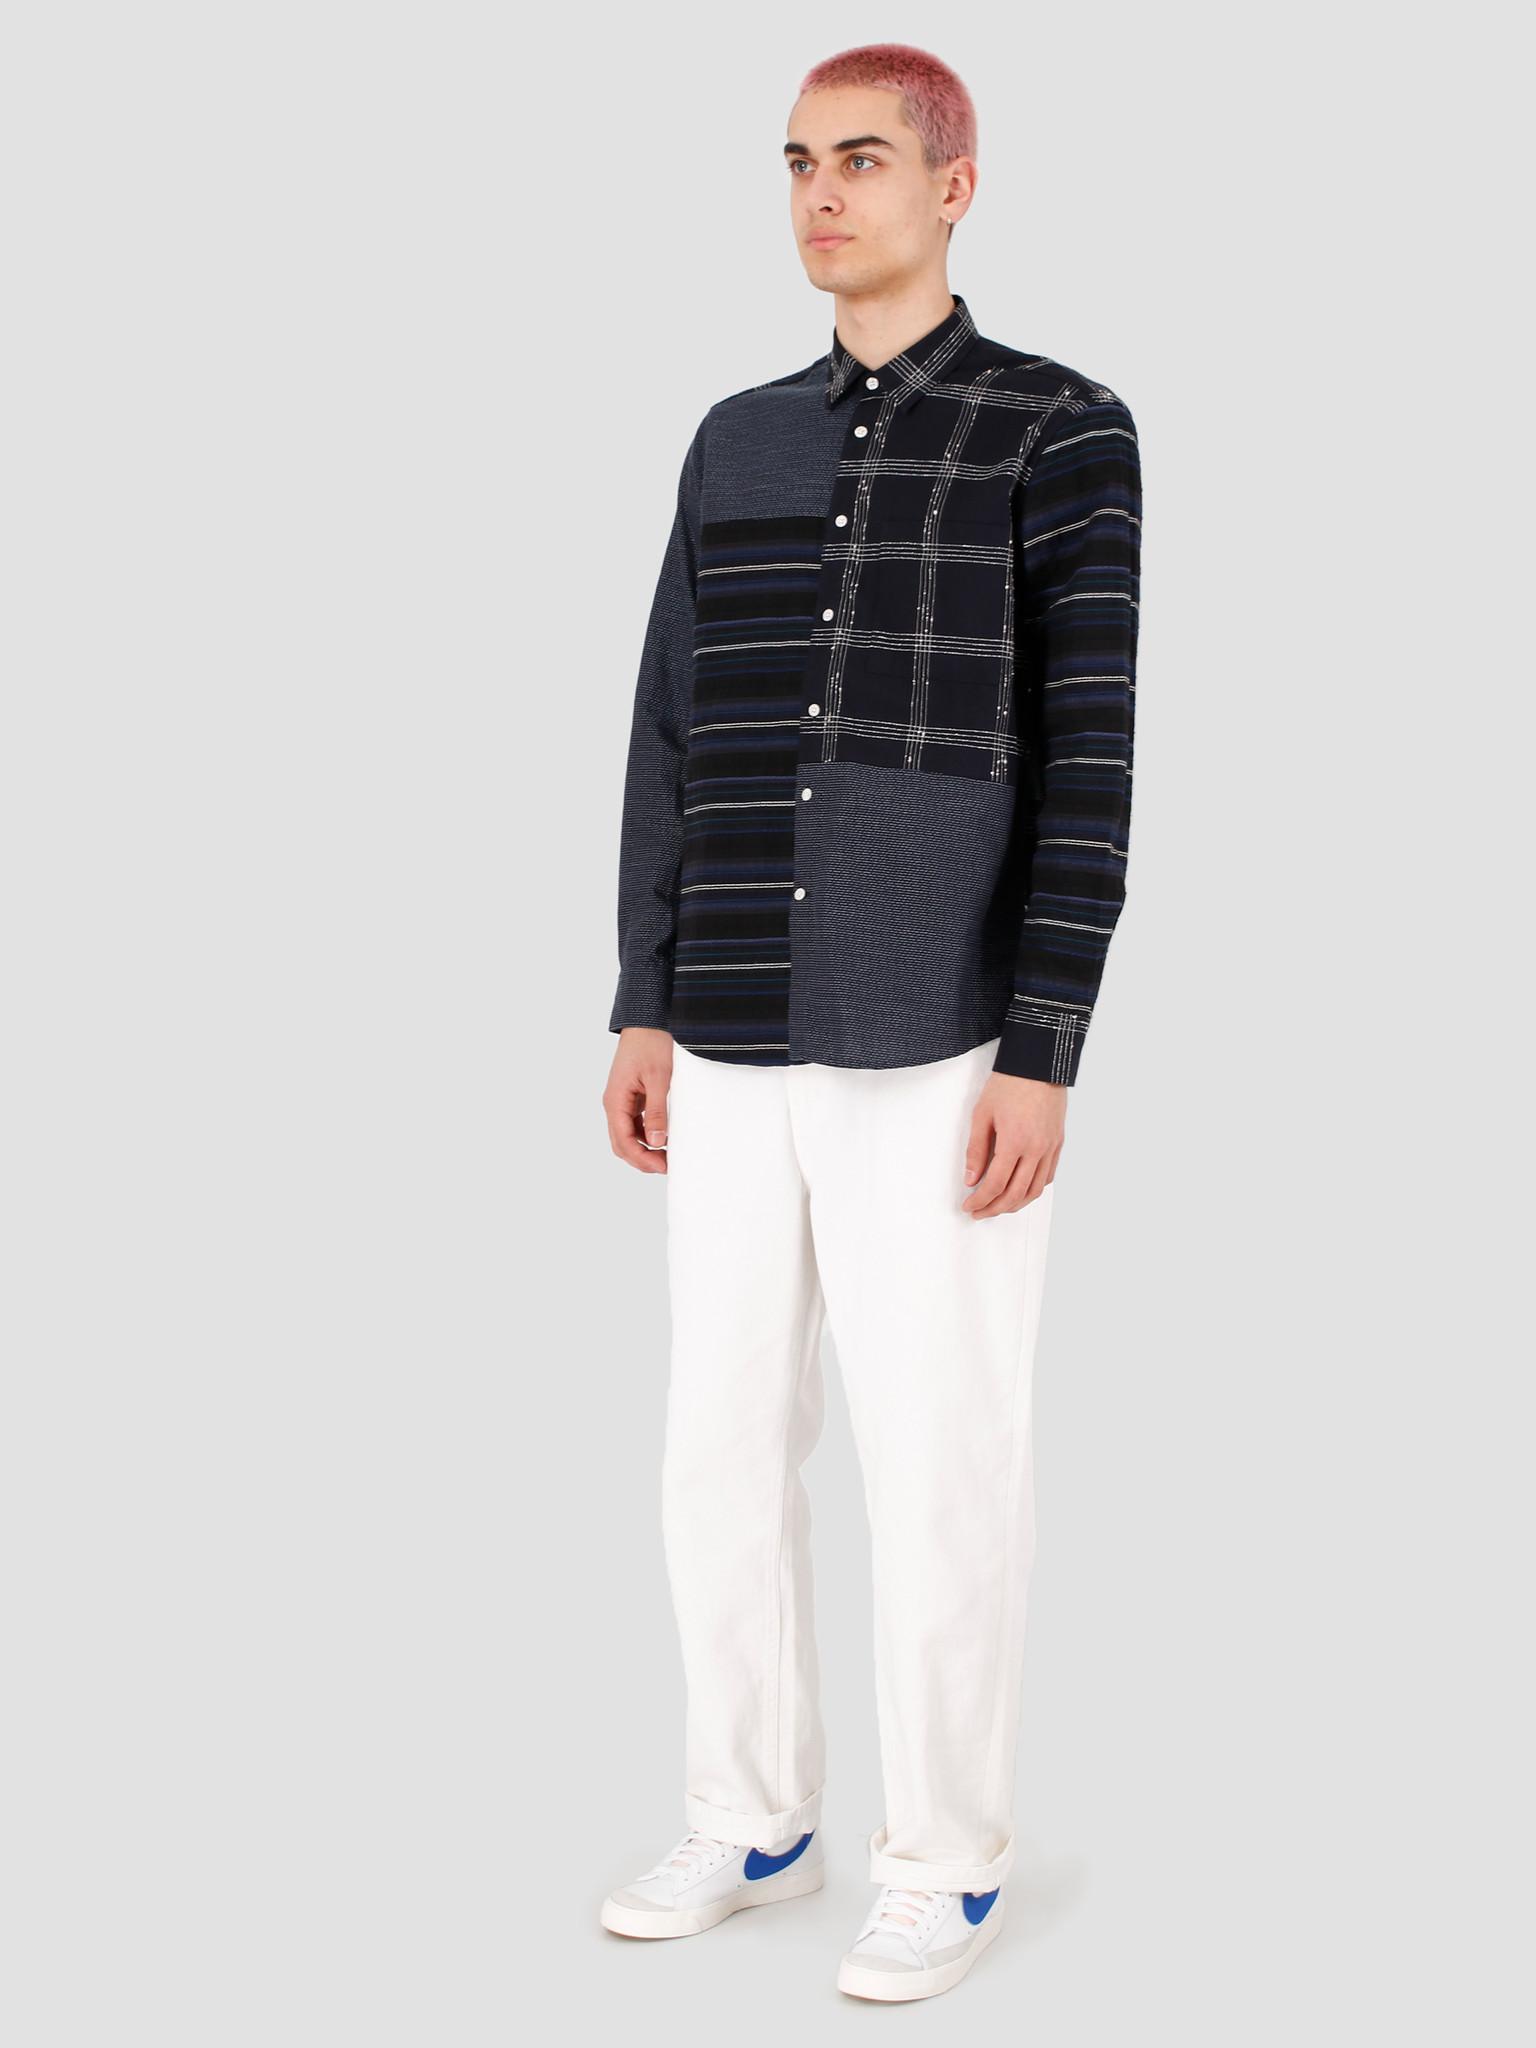 EU FC EU FC Orfeao Patchwork Shirt Navy Textures